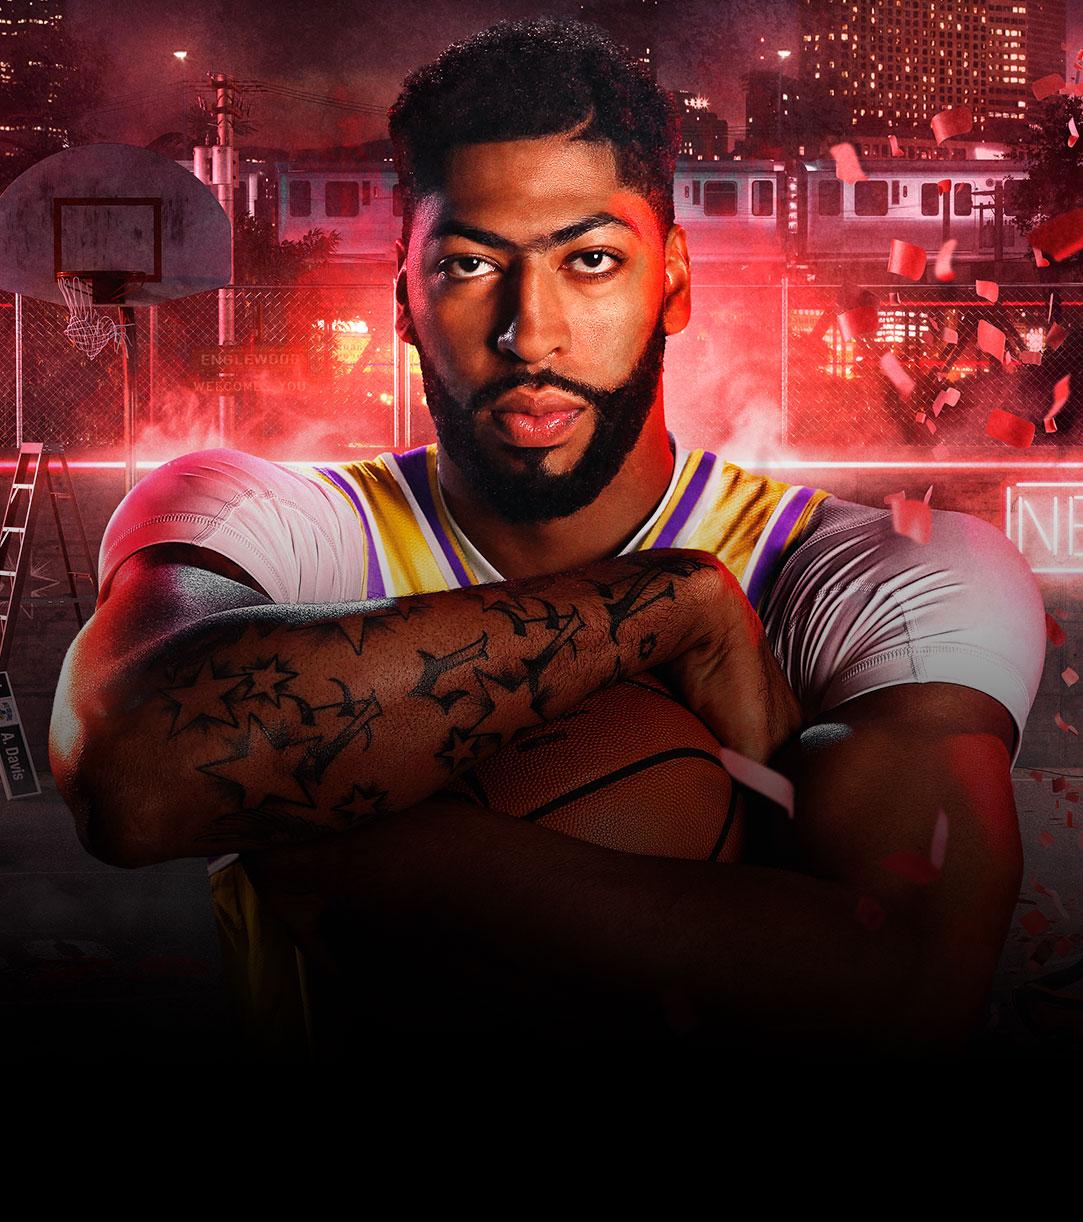 NBA2k20 boxart